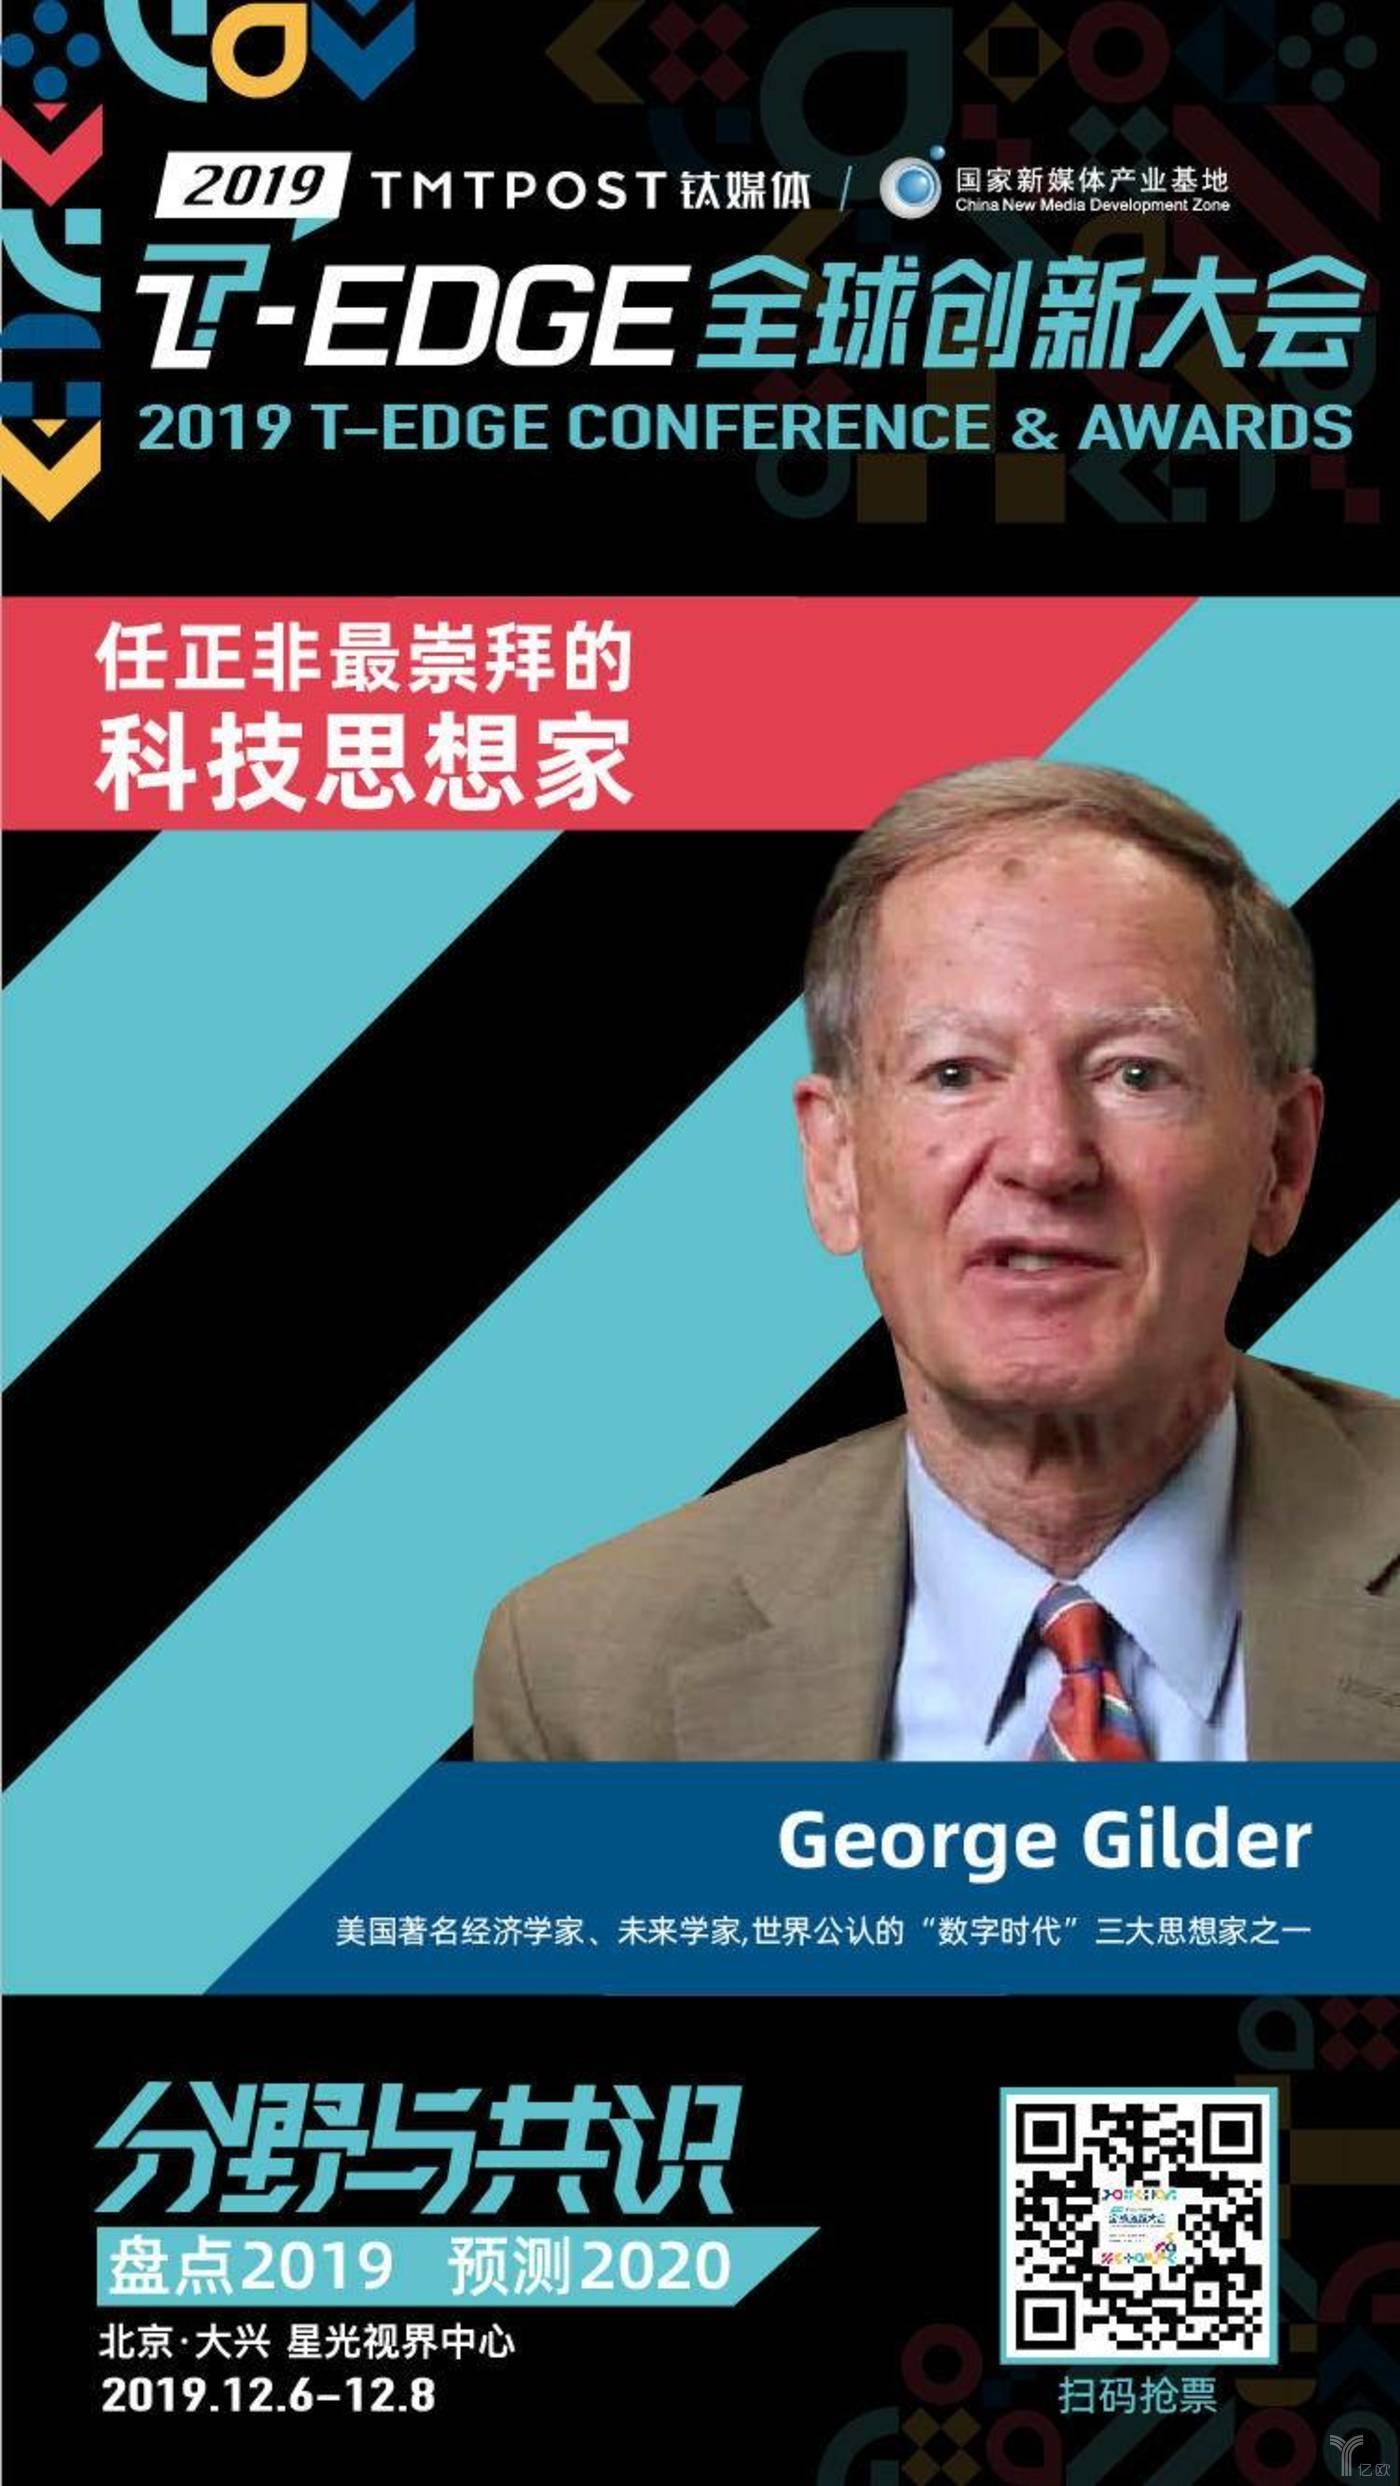 George Gilder.jpeg